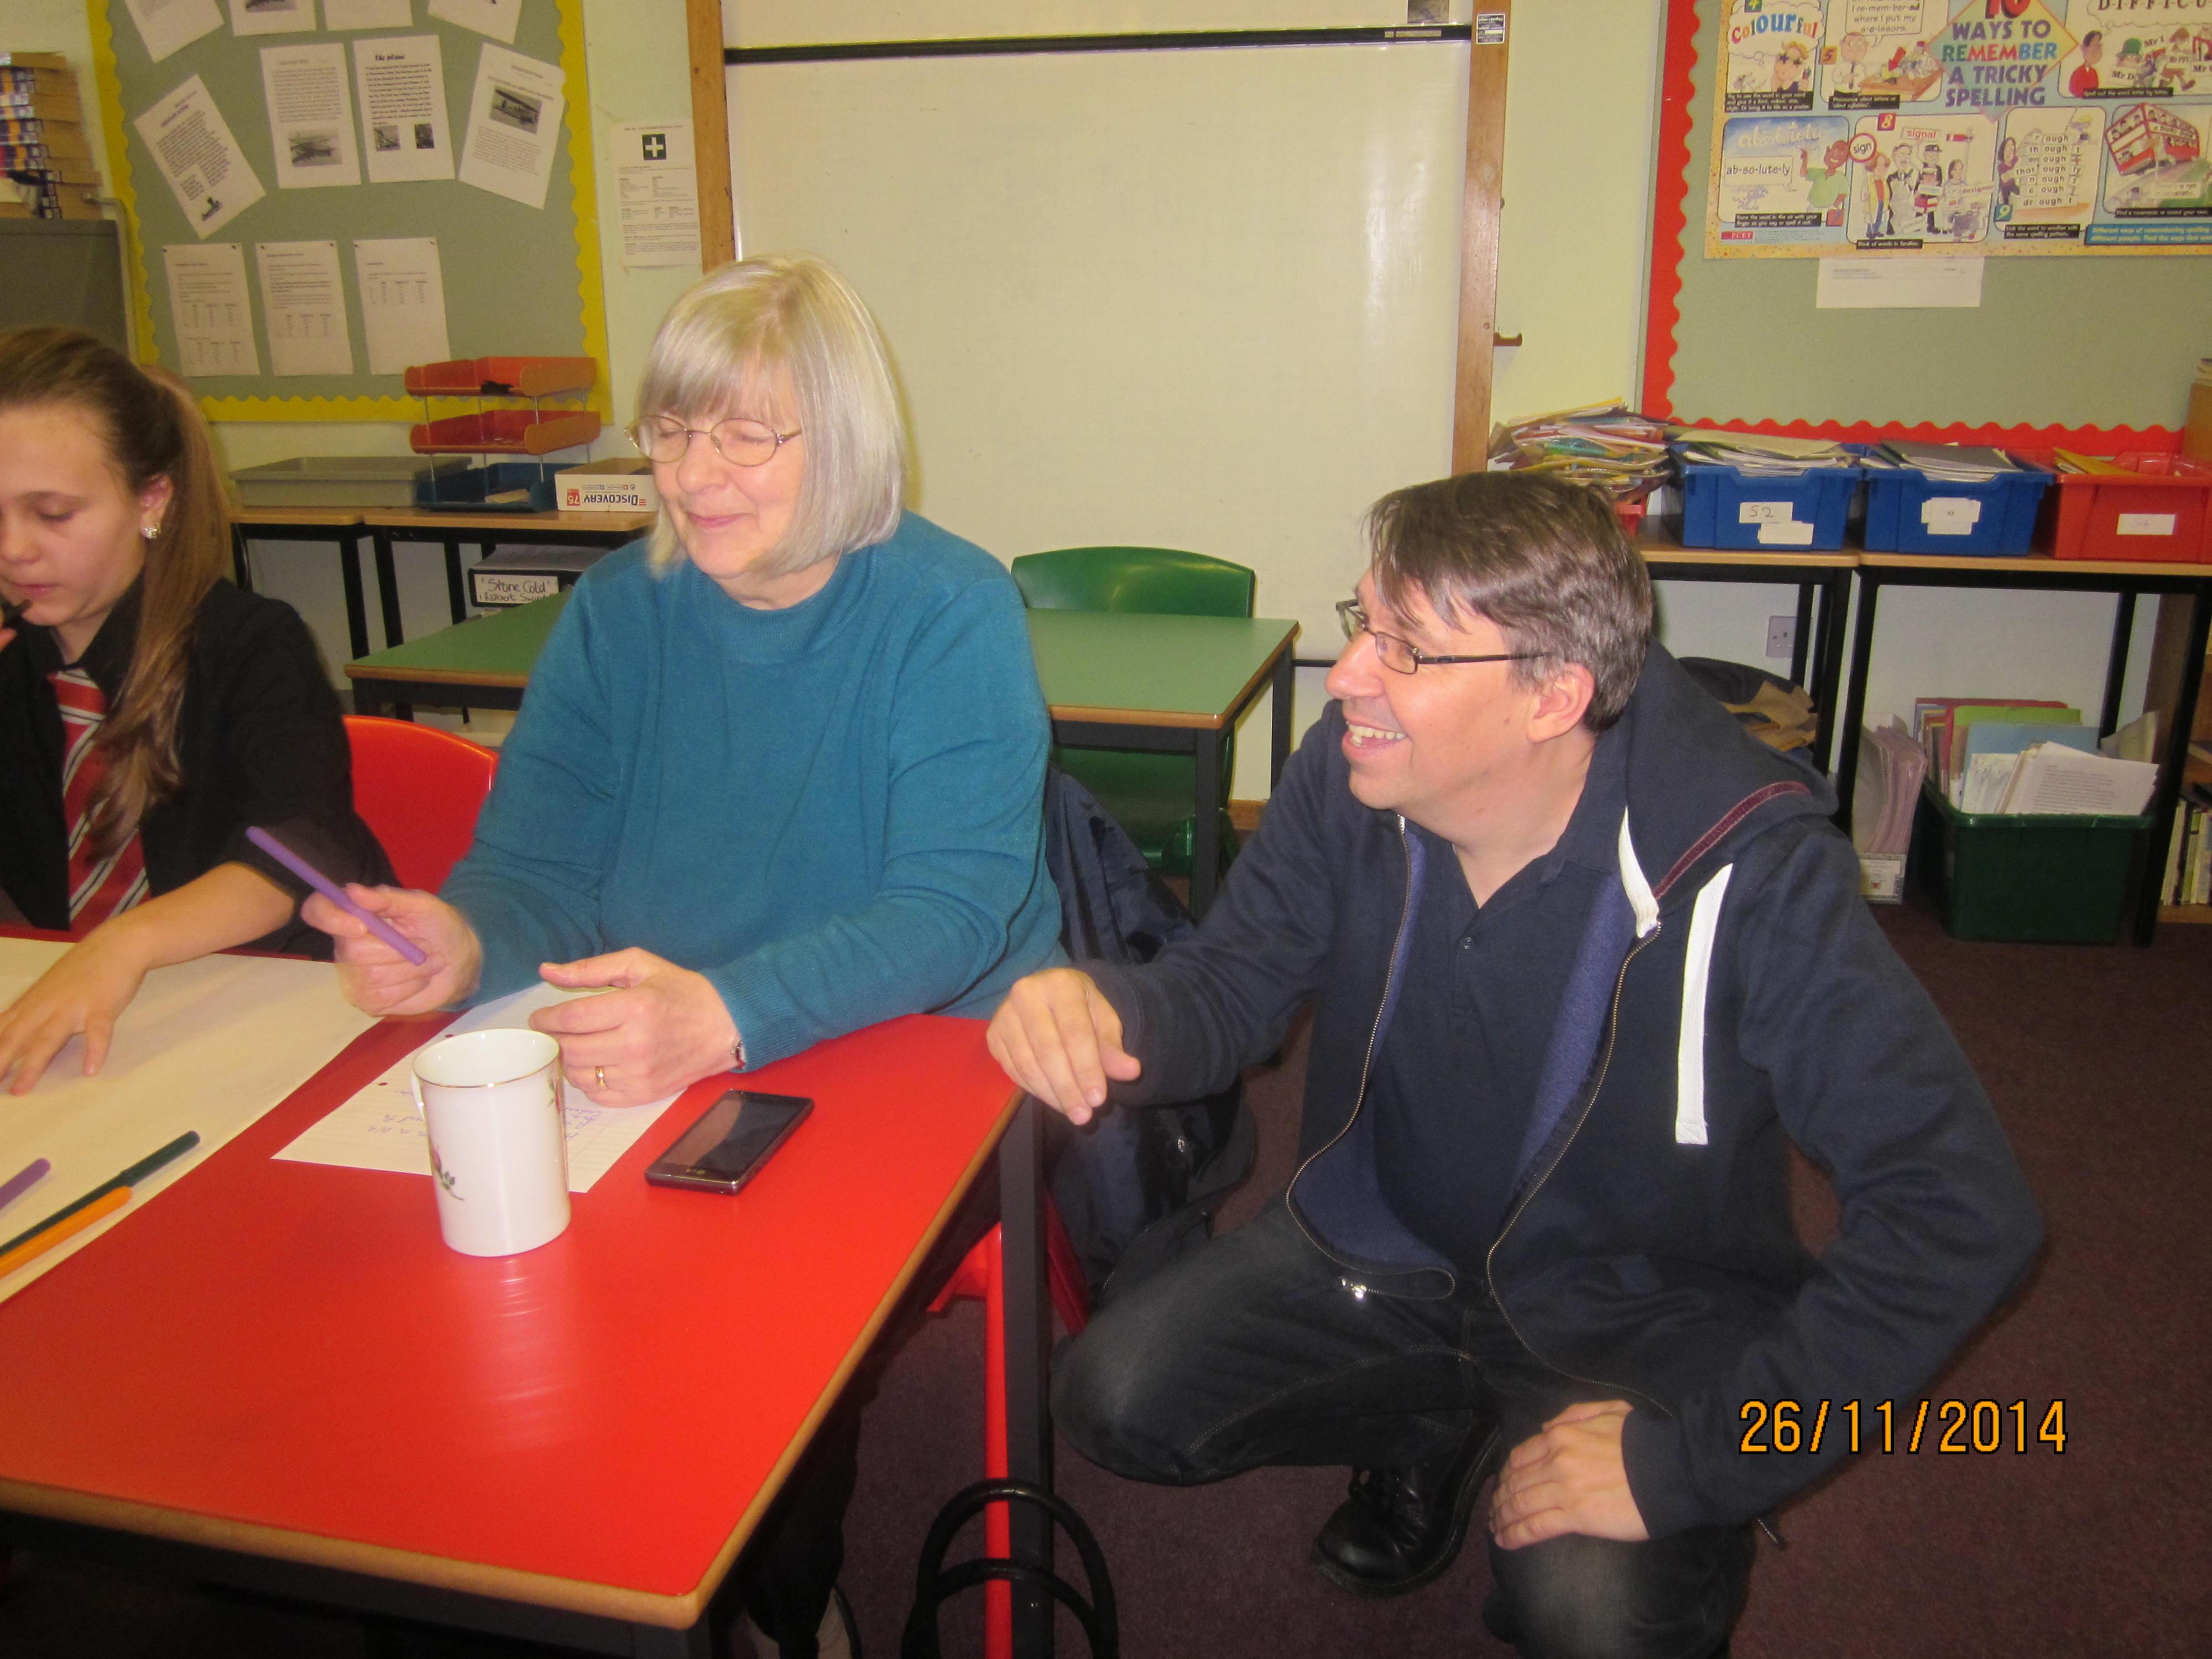 Matthew Fitt and Sheena Wellington visit